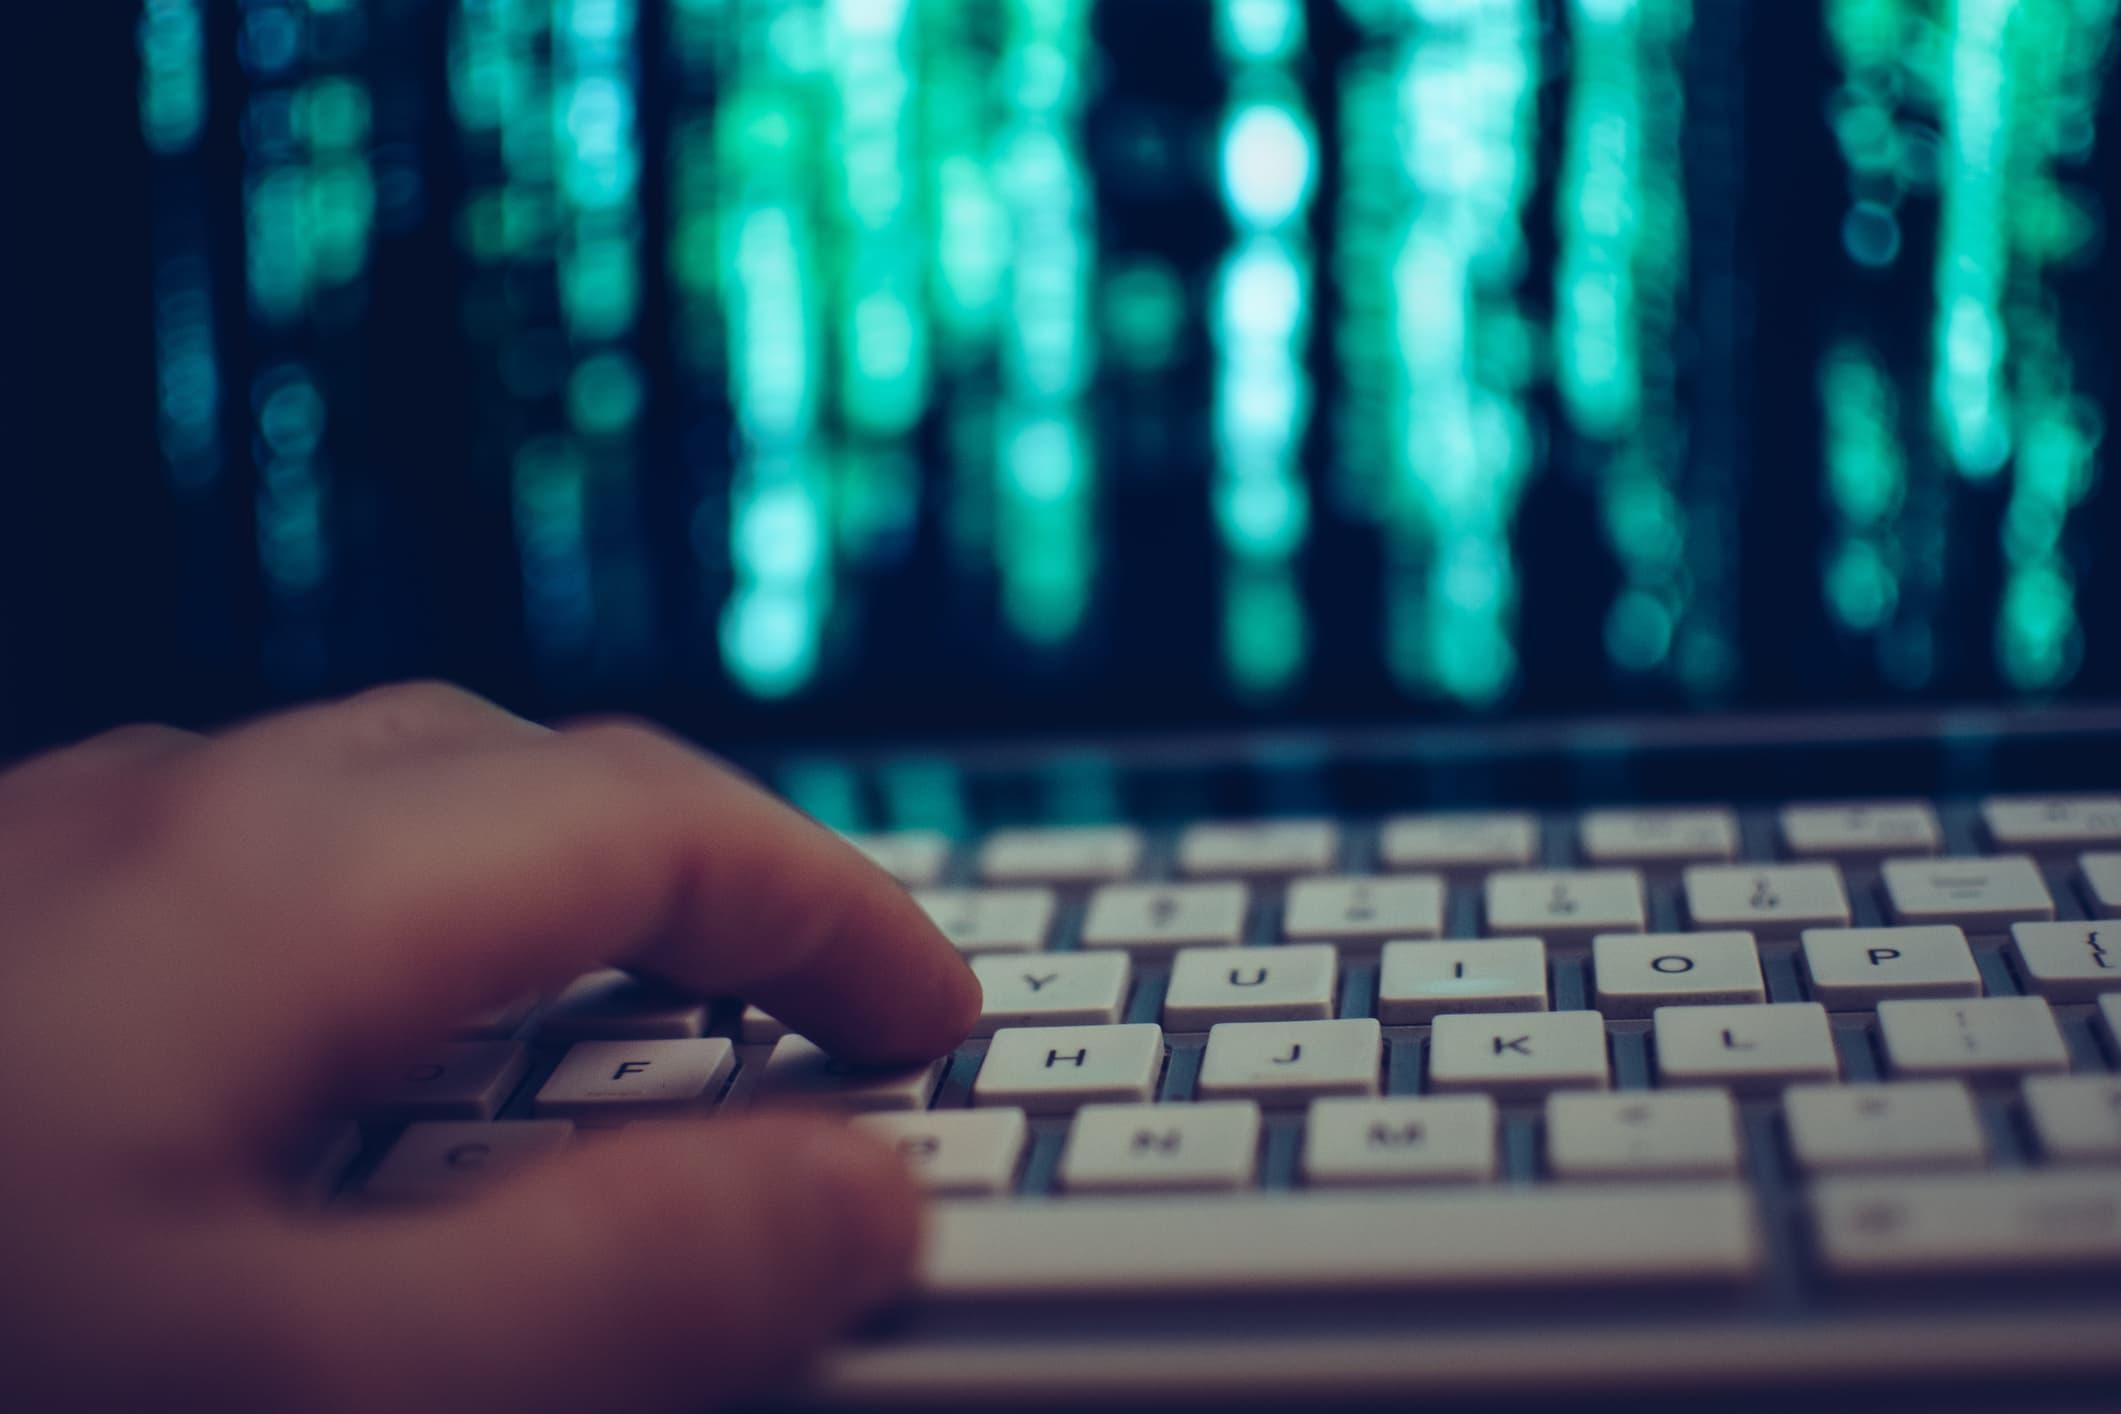 Security start-up Cybereason raises $200 million from Japan's SoftBank